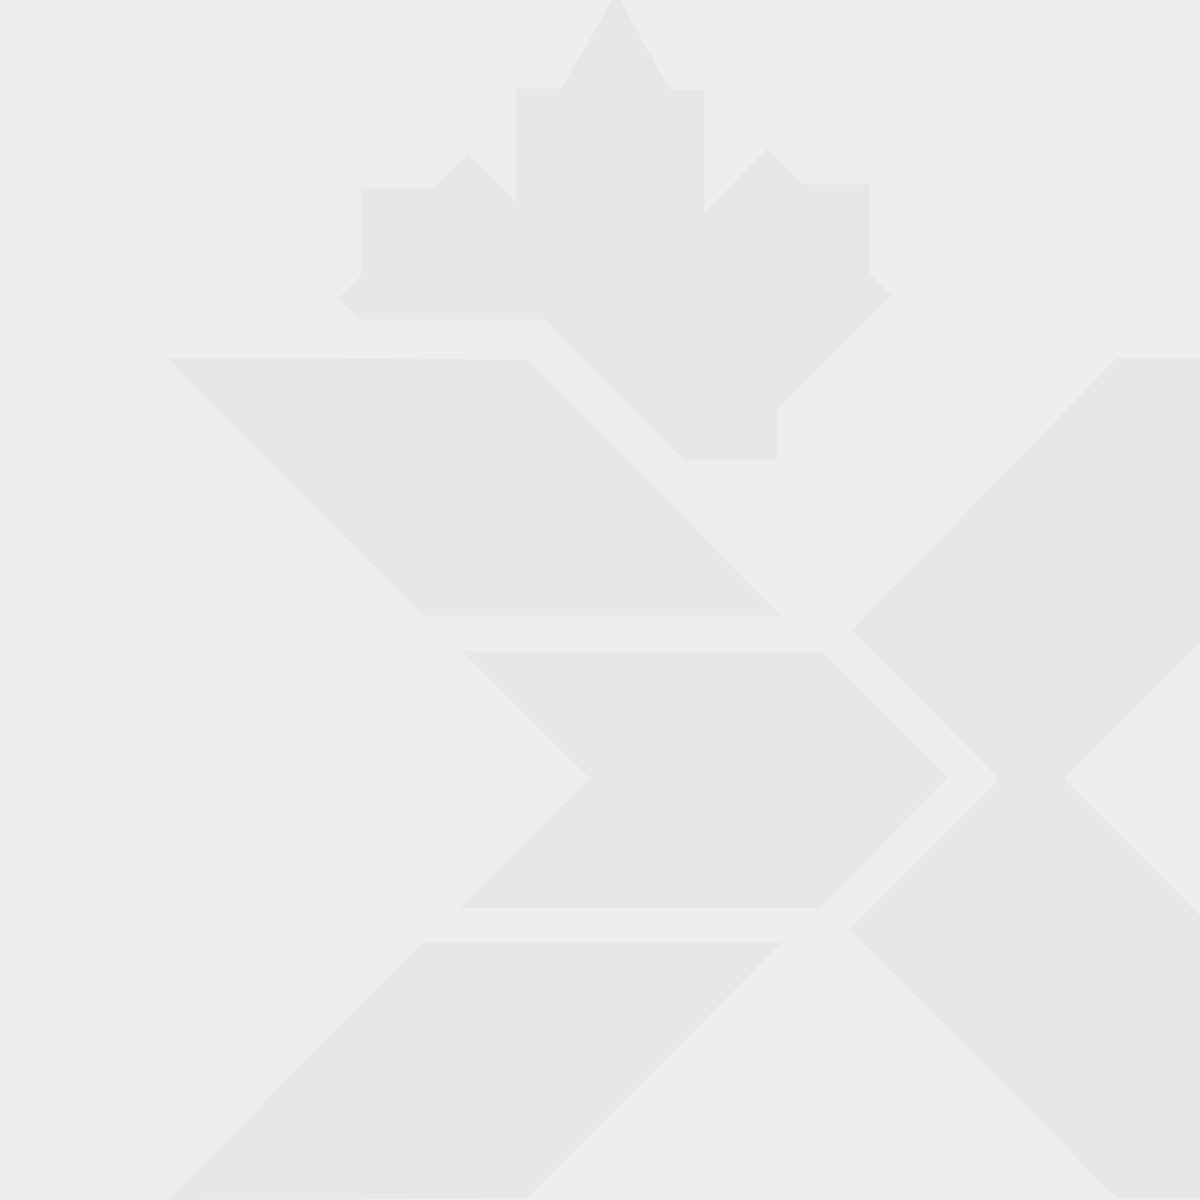 ROYAL CANADIAN AIR FORCE - Men's T-shirts 3 pack - Black, Grey, Green